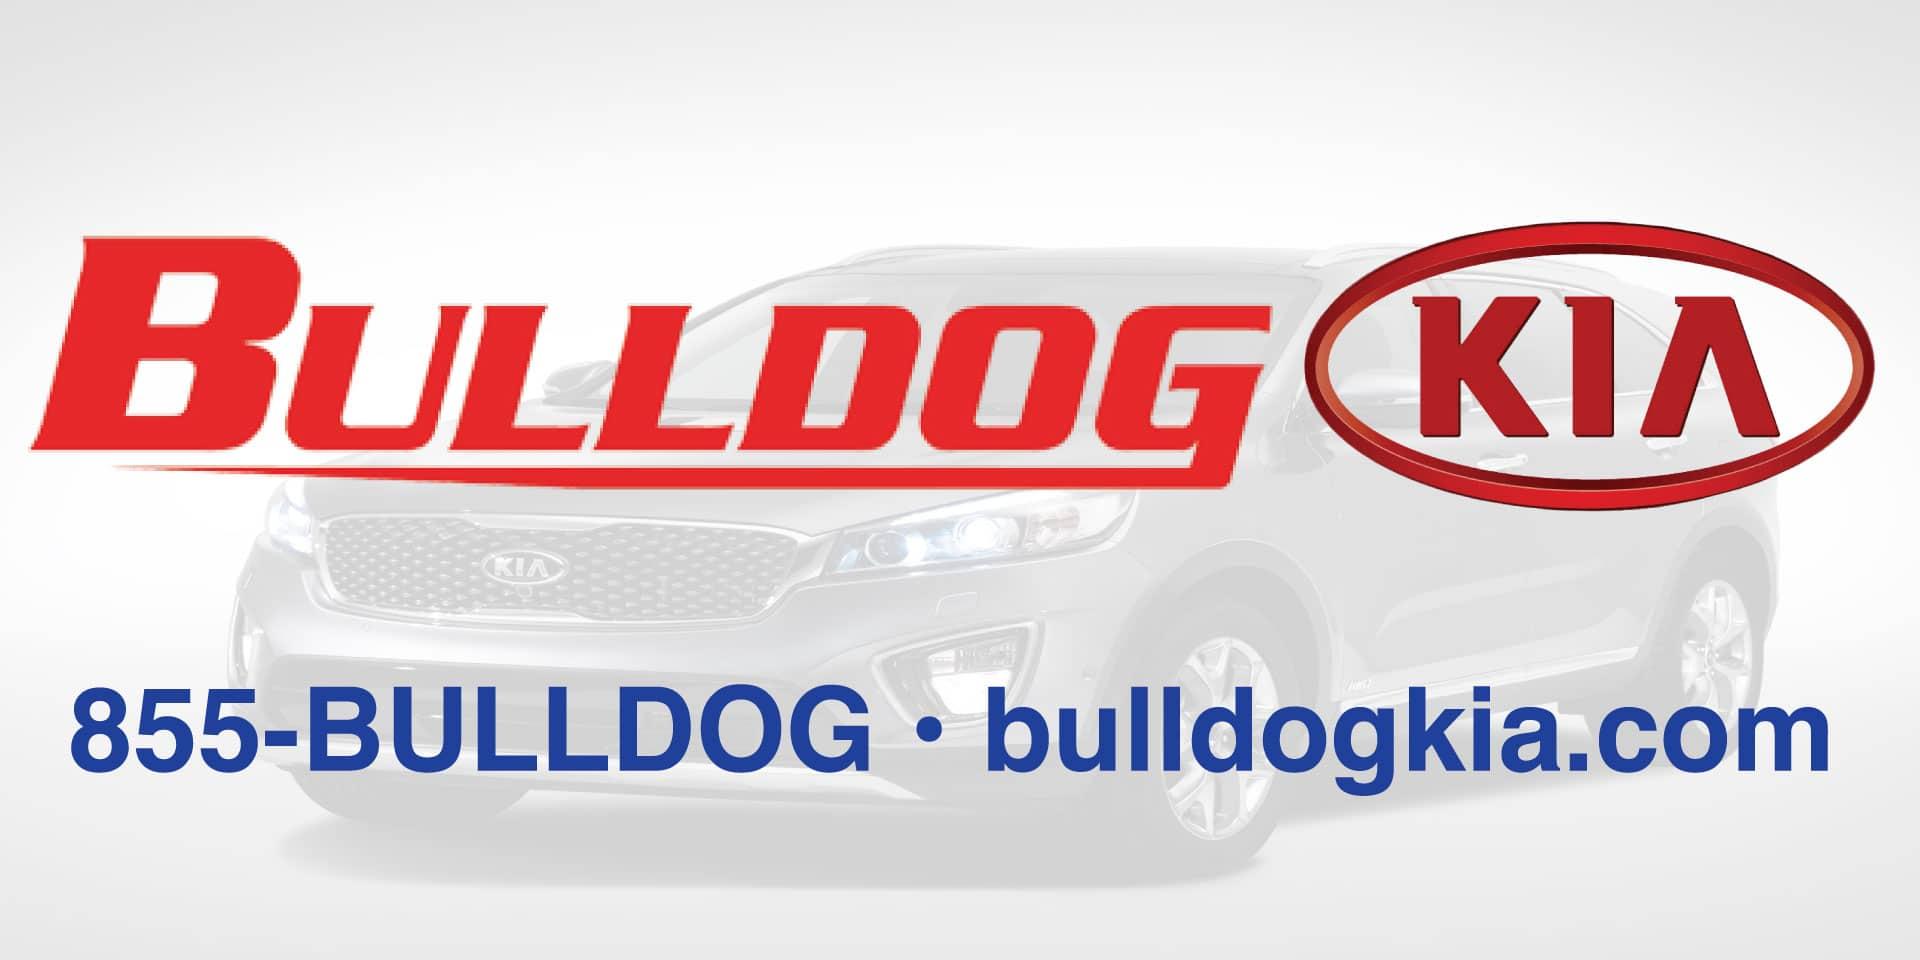 BullDog KIA, We'll See Ya, A BullDog KIA